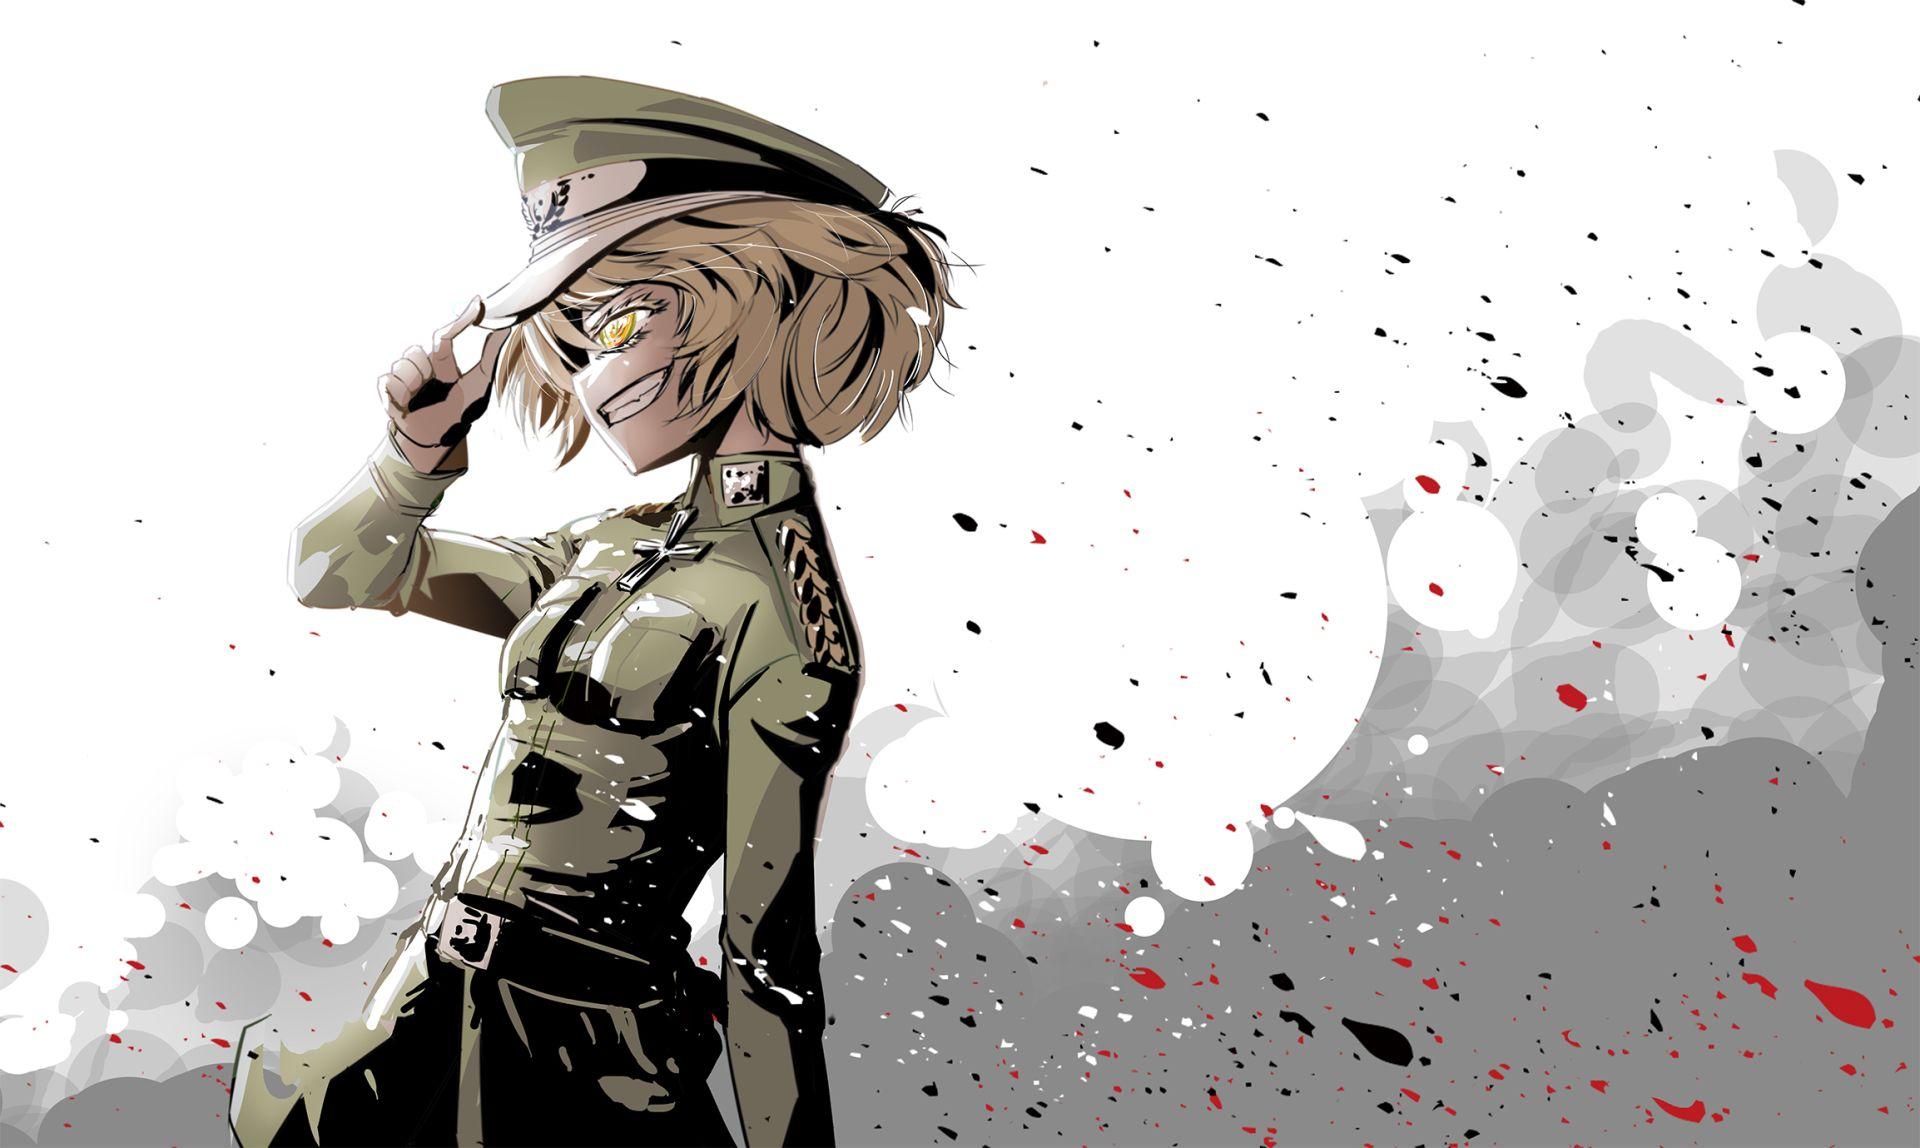 Anime Youjo Senki Tanya Degurechaff Wallpaper Ilustracao De